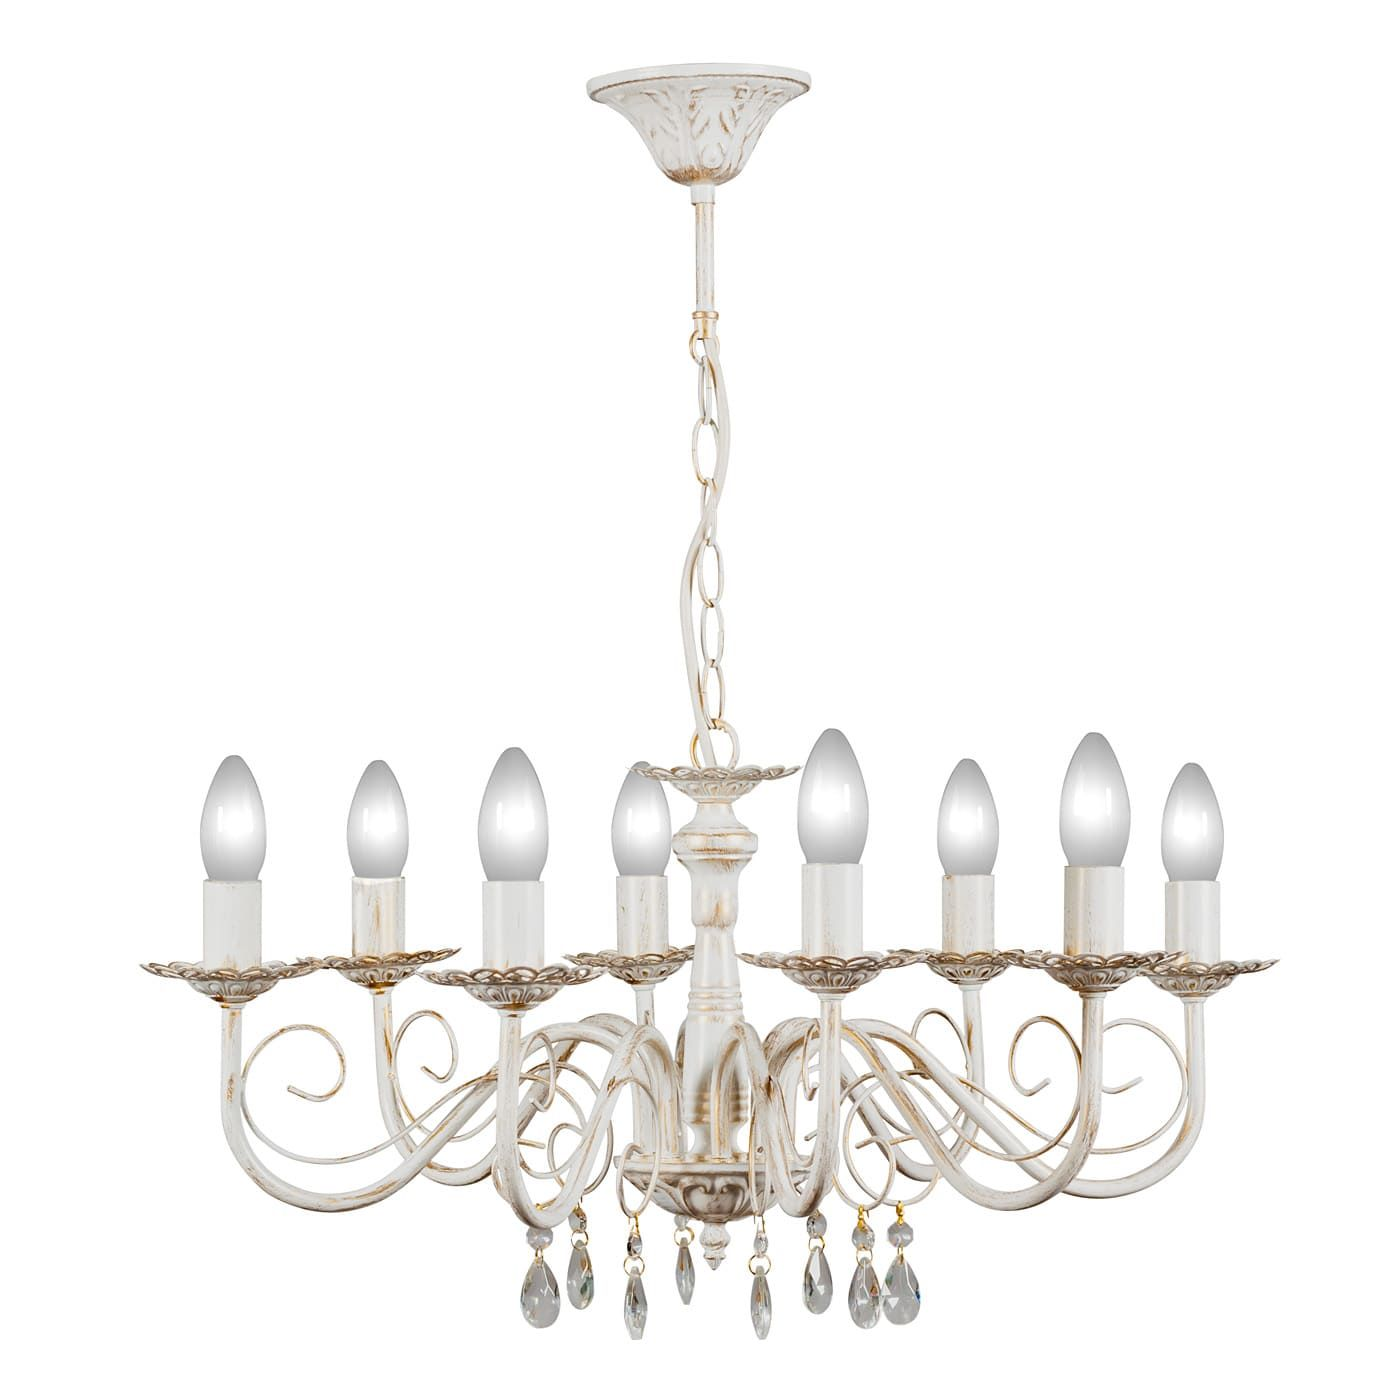 PETRASVET / Pendant chandelier S1019-8, 8xE14 max. 60W